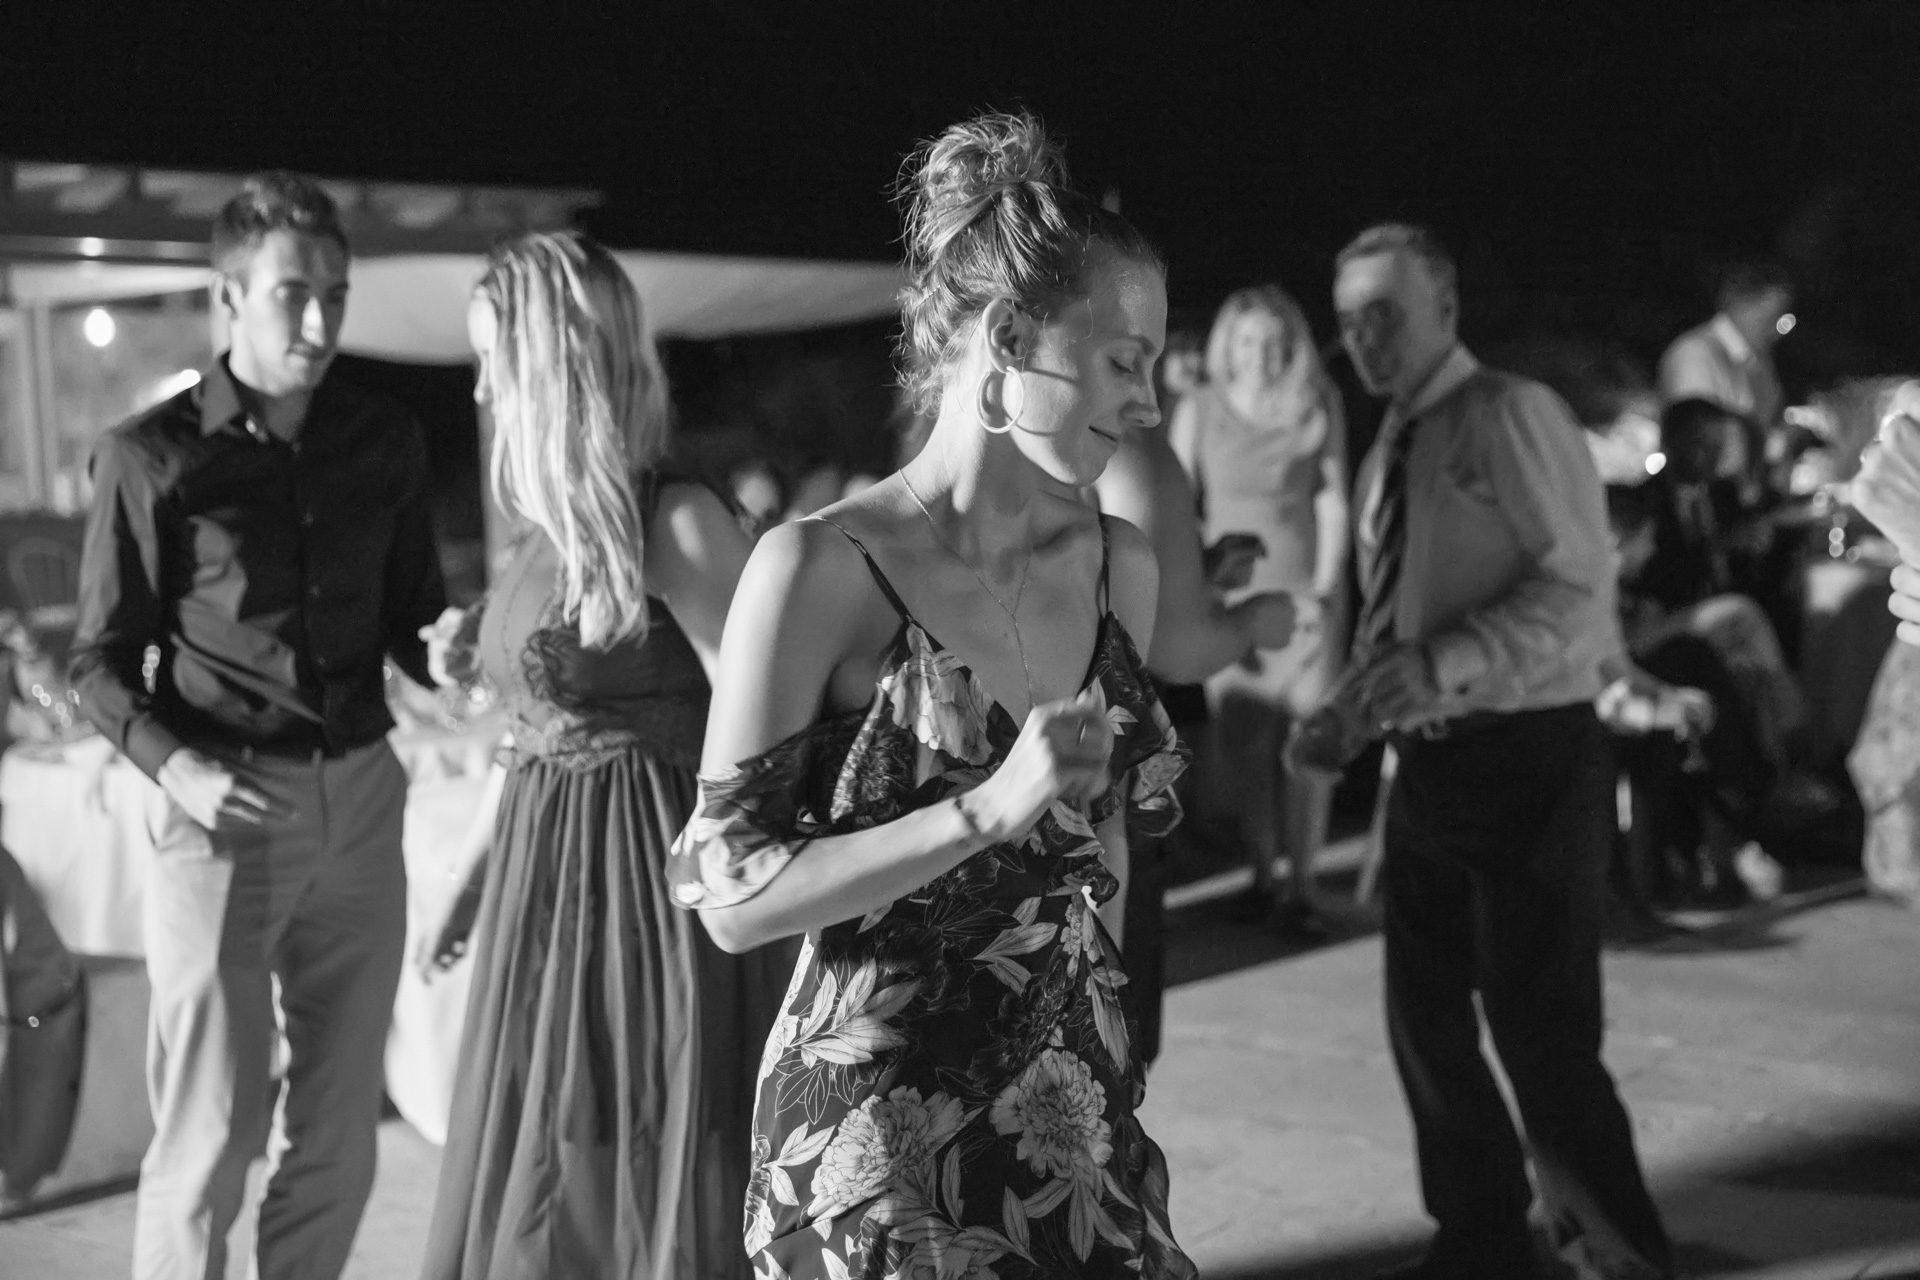 Fotografoi Sparti Fotografoi Spartis φωτογραφοι σπαρτη φωτογραφοι σπαρτης,αλεξανδρακης δημητρης Alexandrakis Alexandrakis Photography (57)